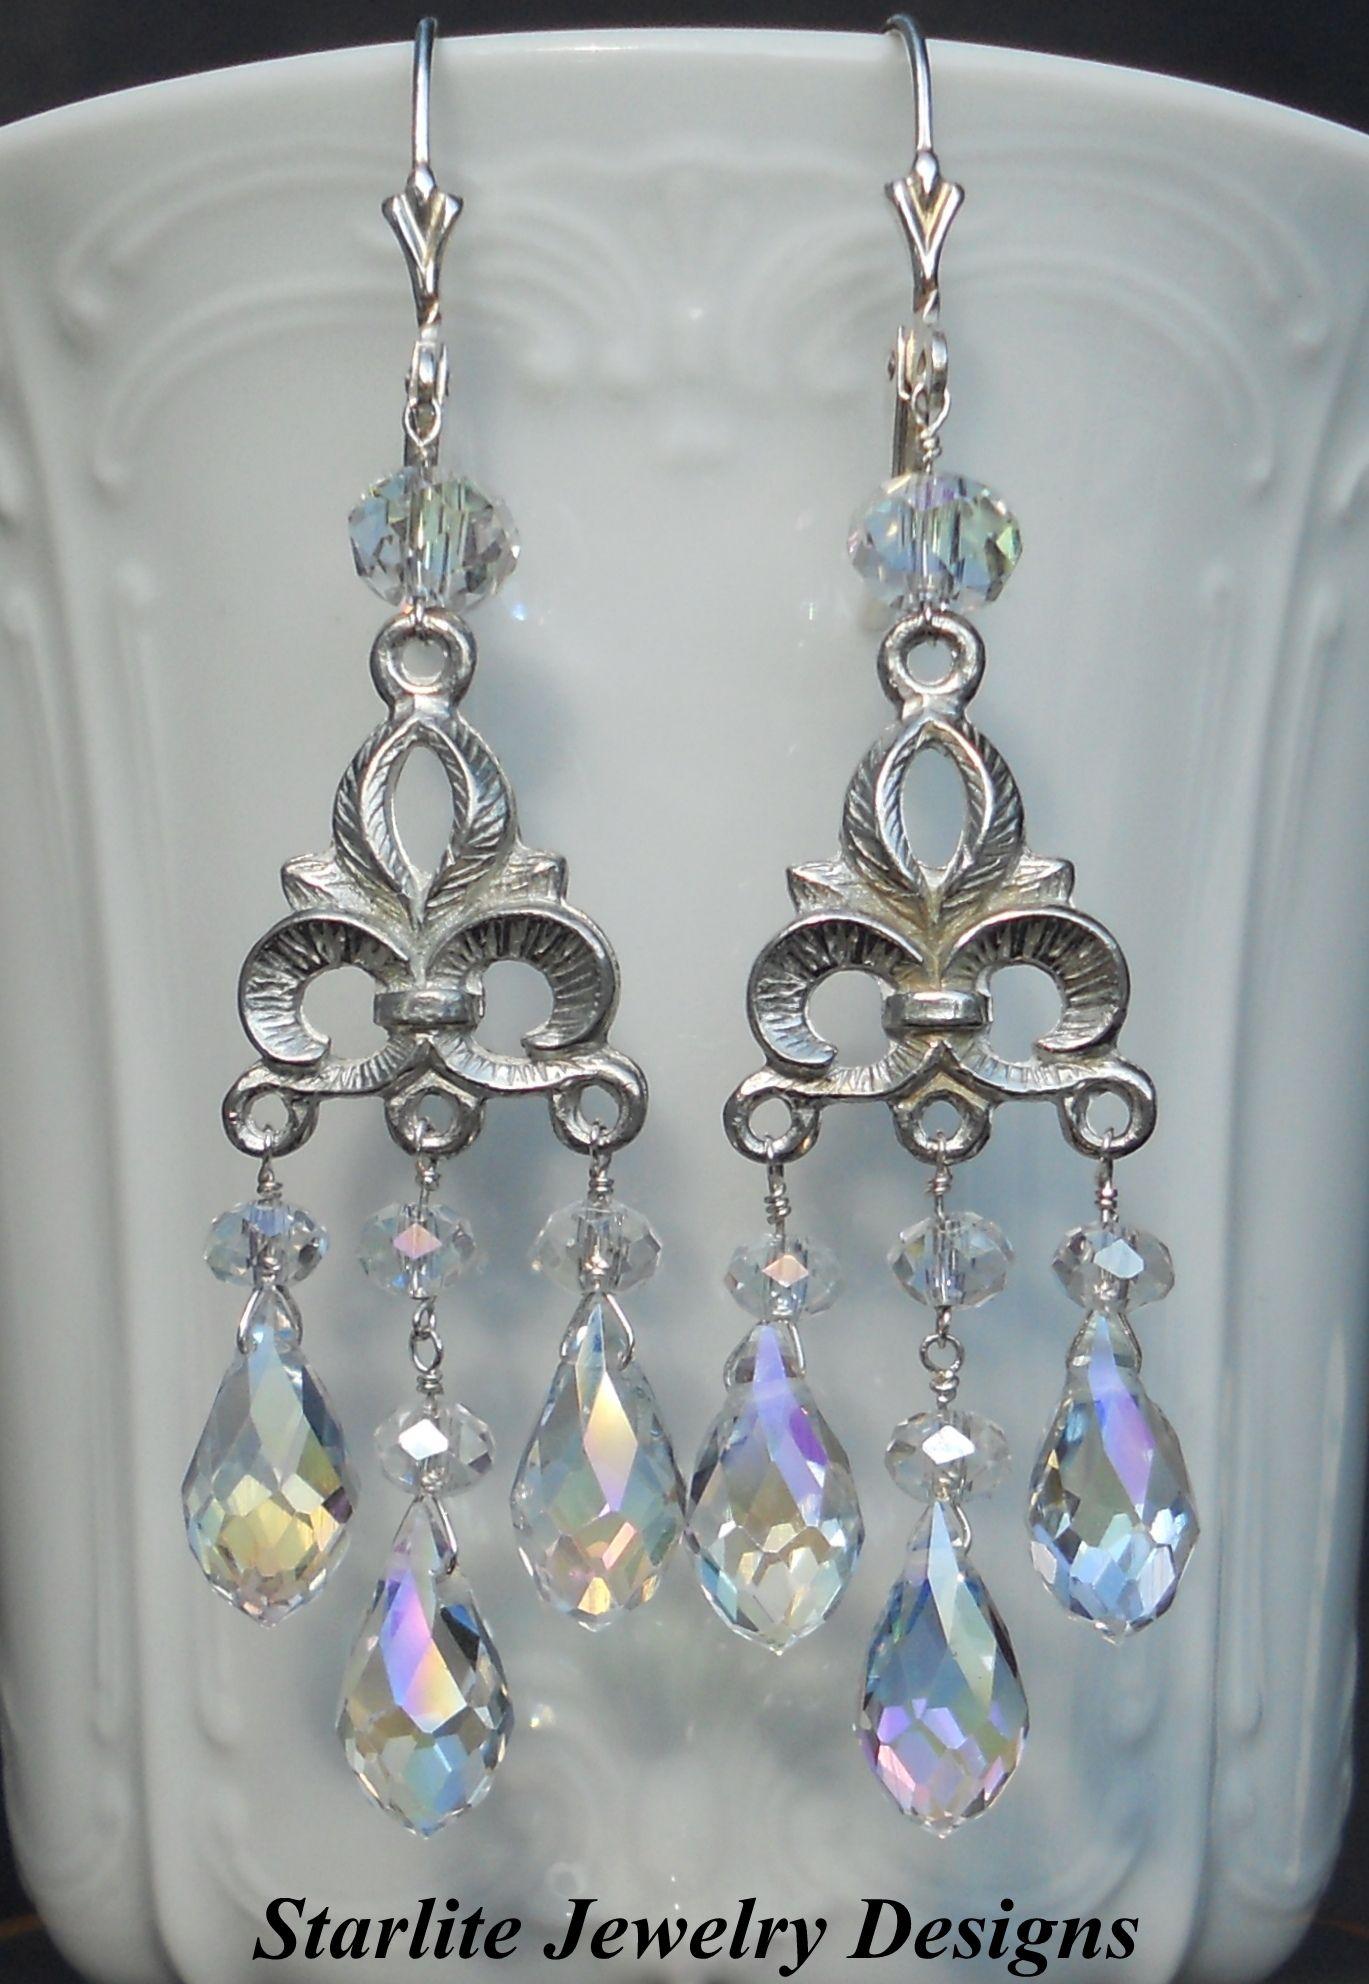 Vintage Fleur de Lis Rainbow Crystal Chandelier Earrings Perfect